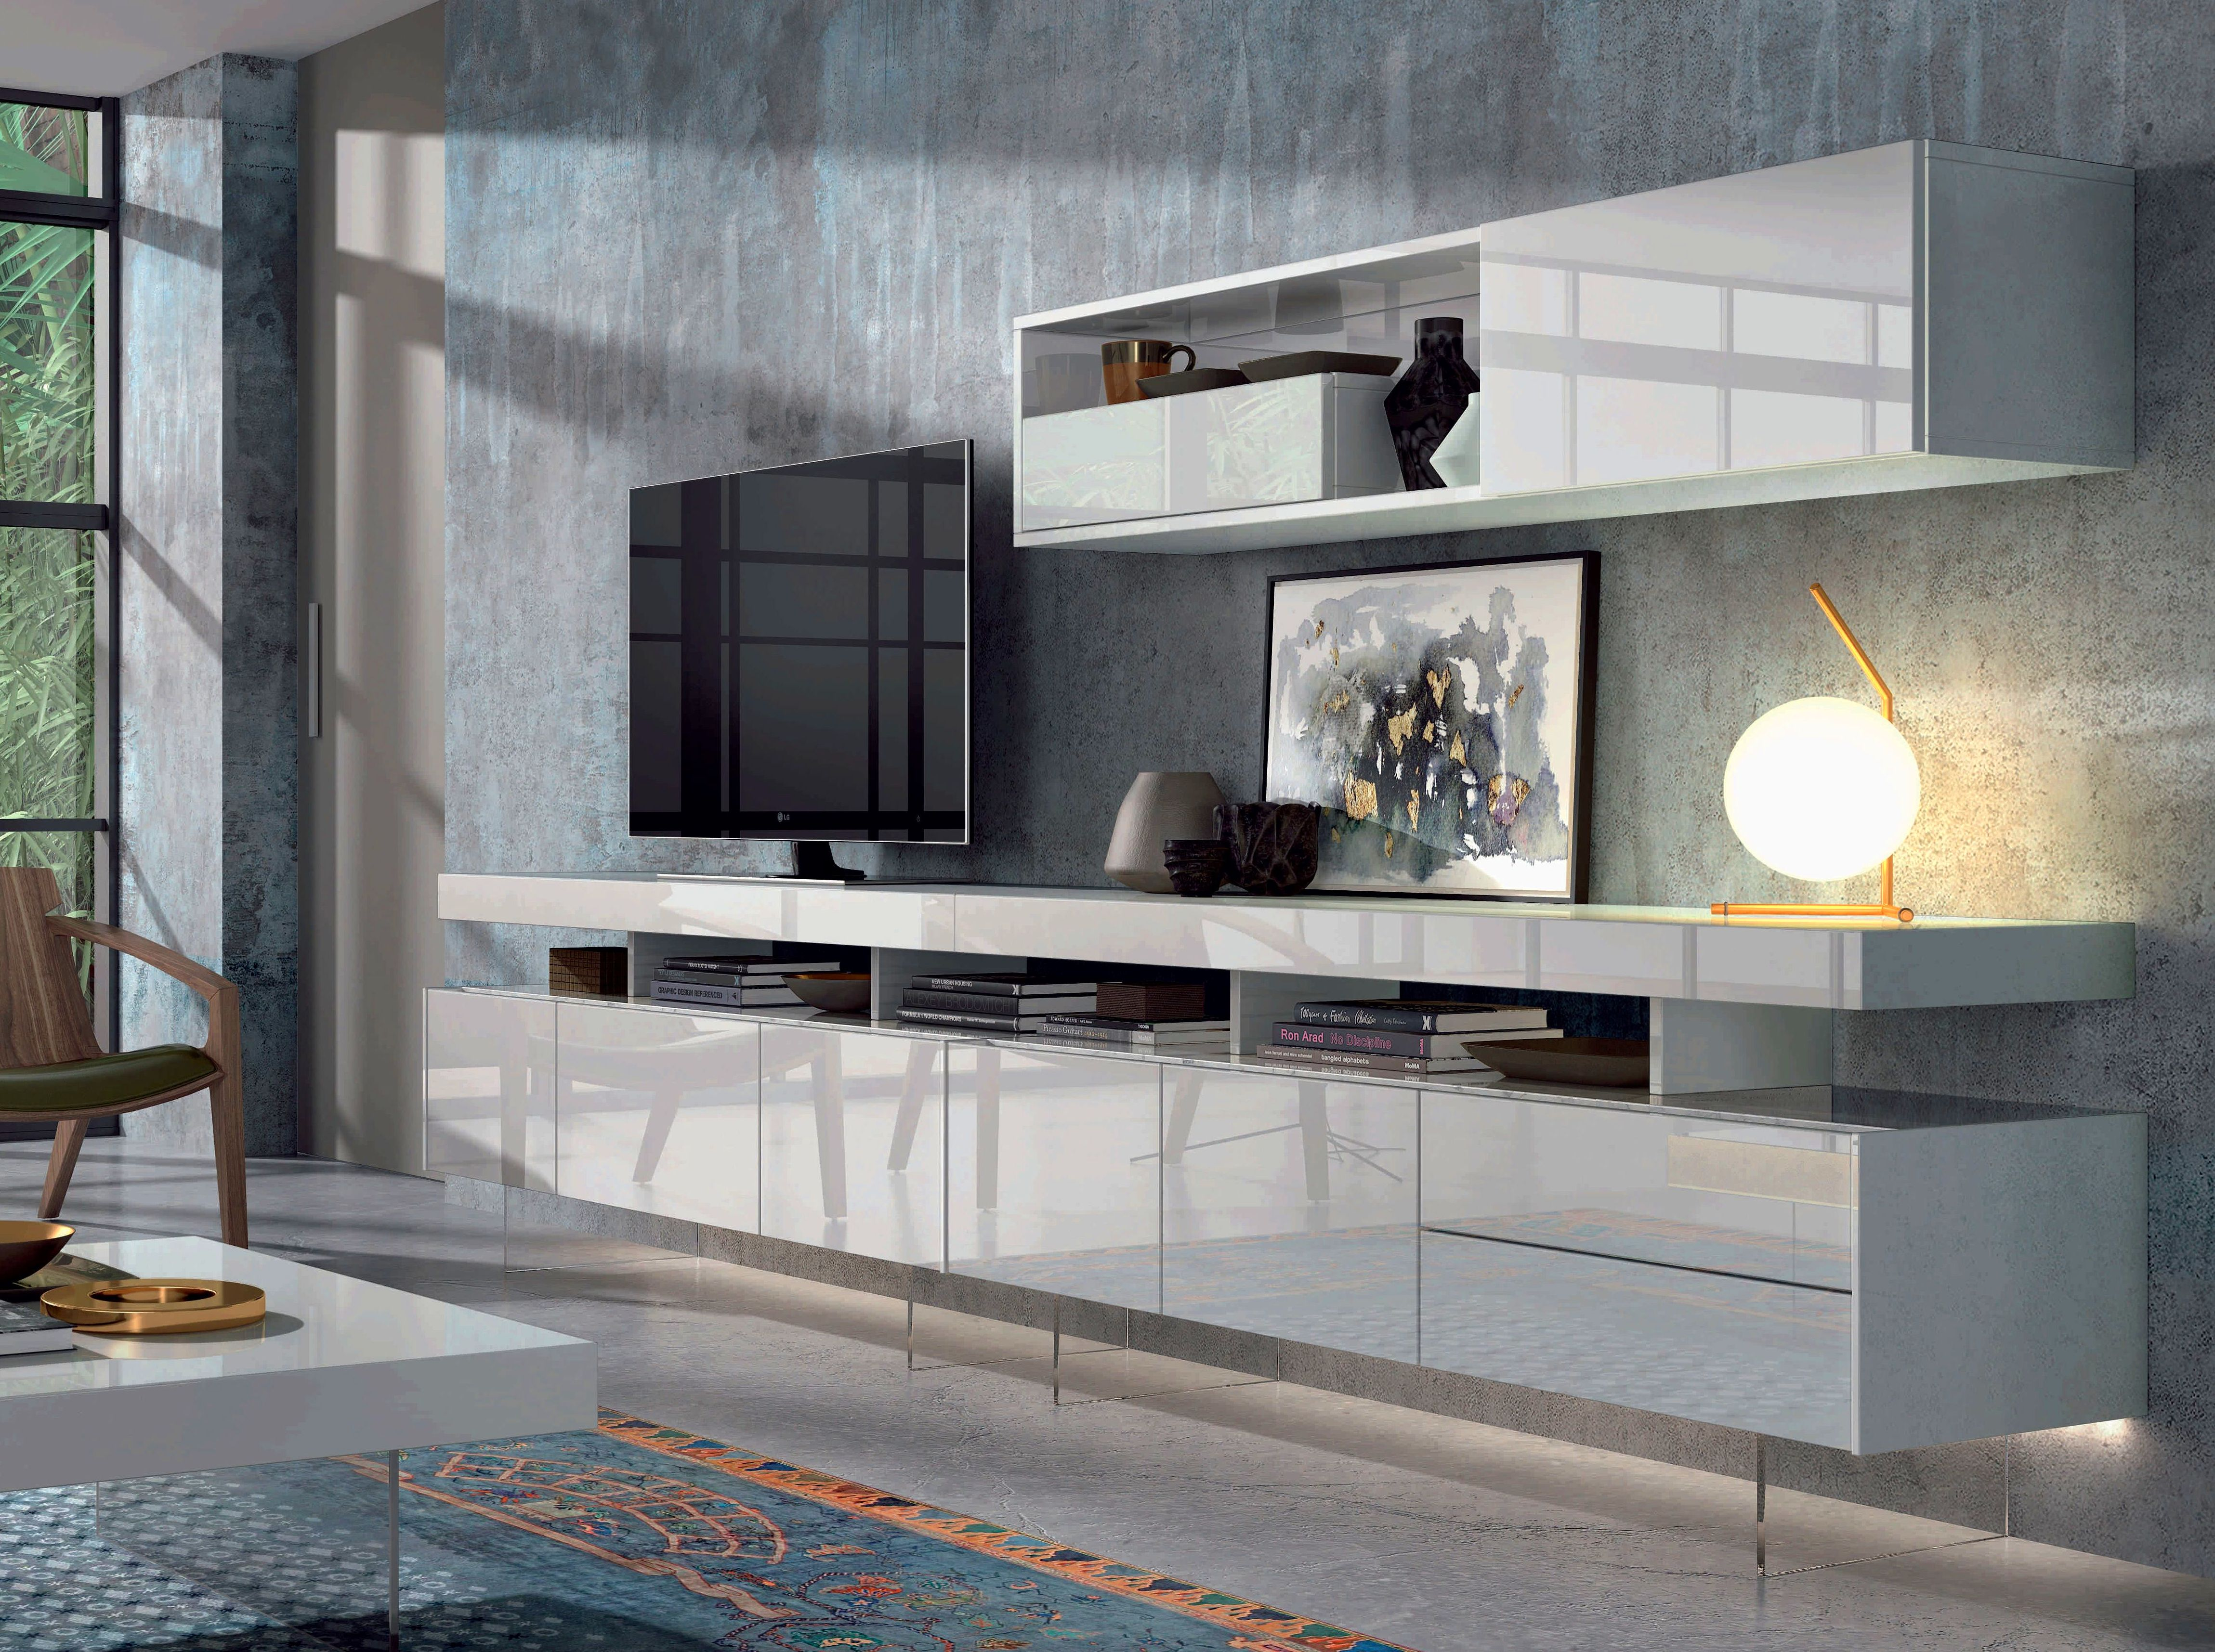 Apilable Salón Moderno Madrid Lacado Brillo